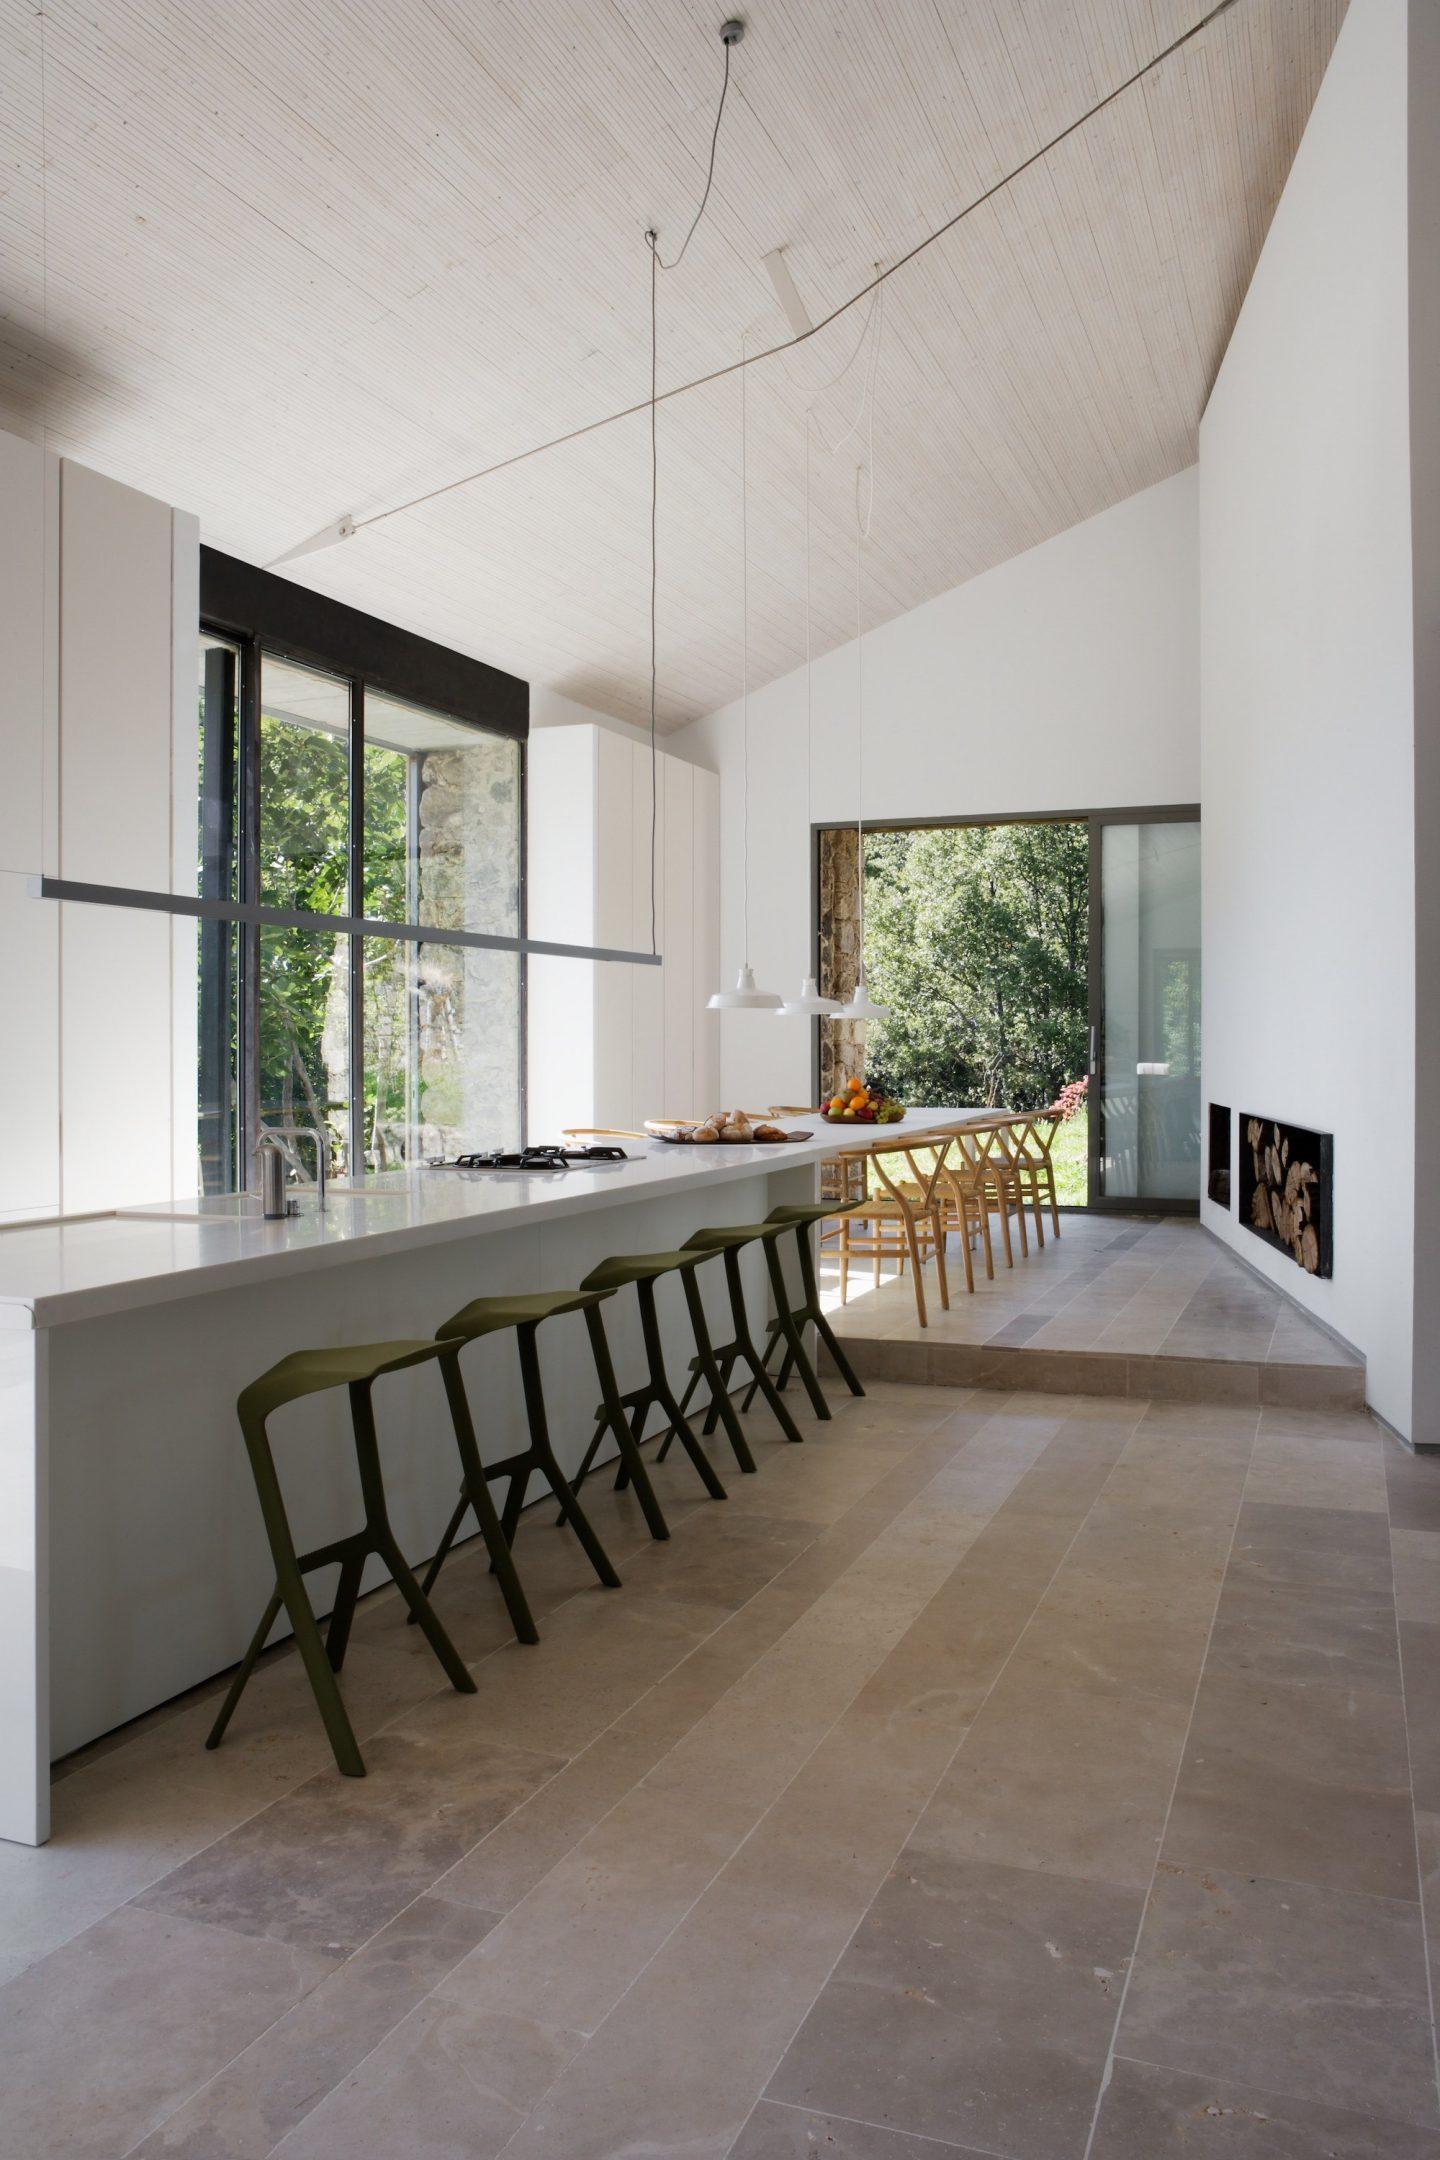 IGNANT-Travel-Abaton-Arquitectura-Finca-Extremadura-014